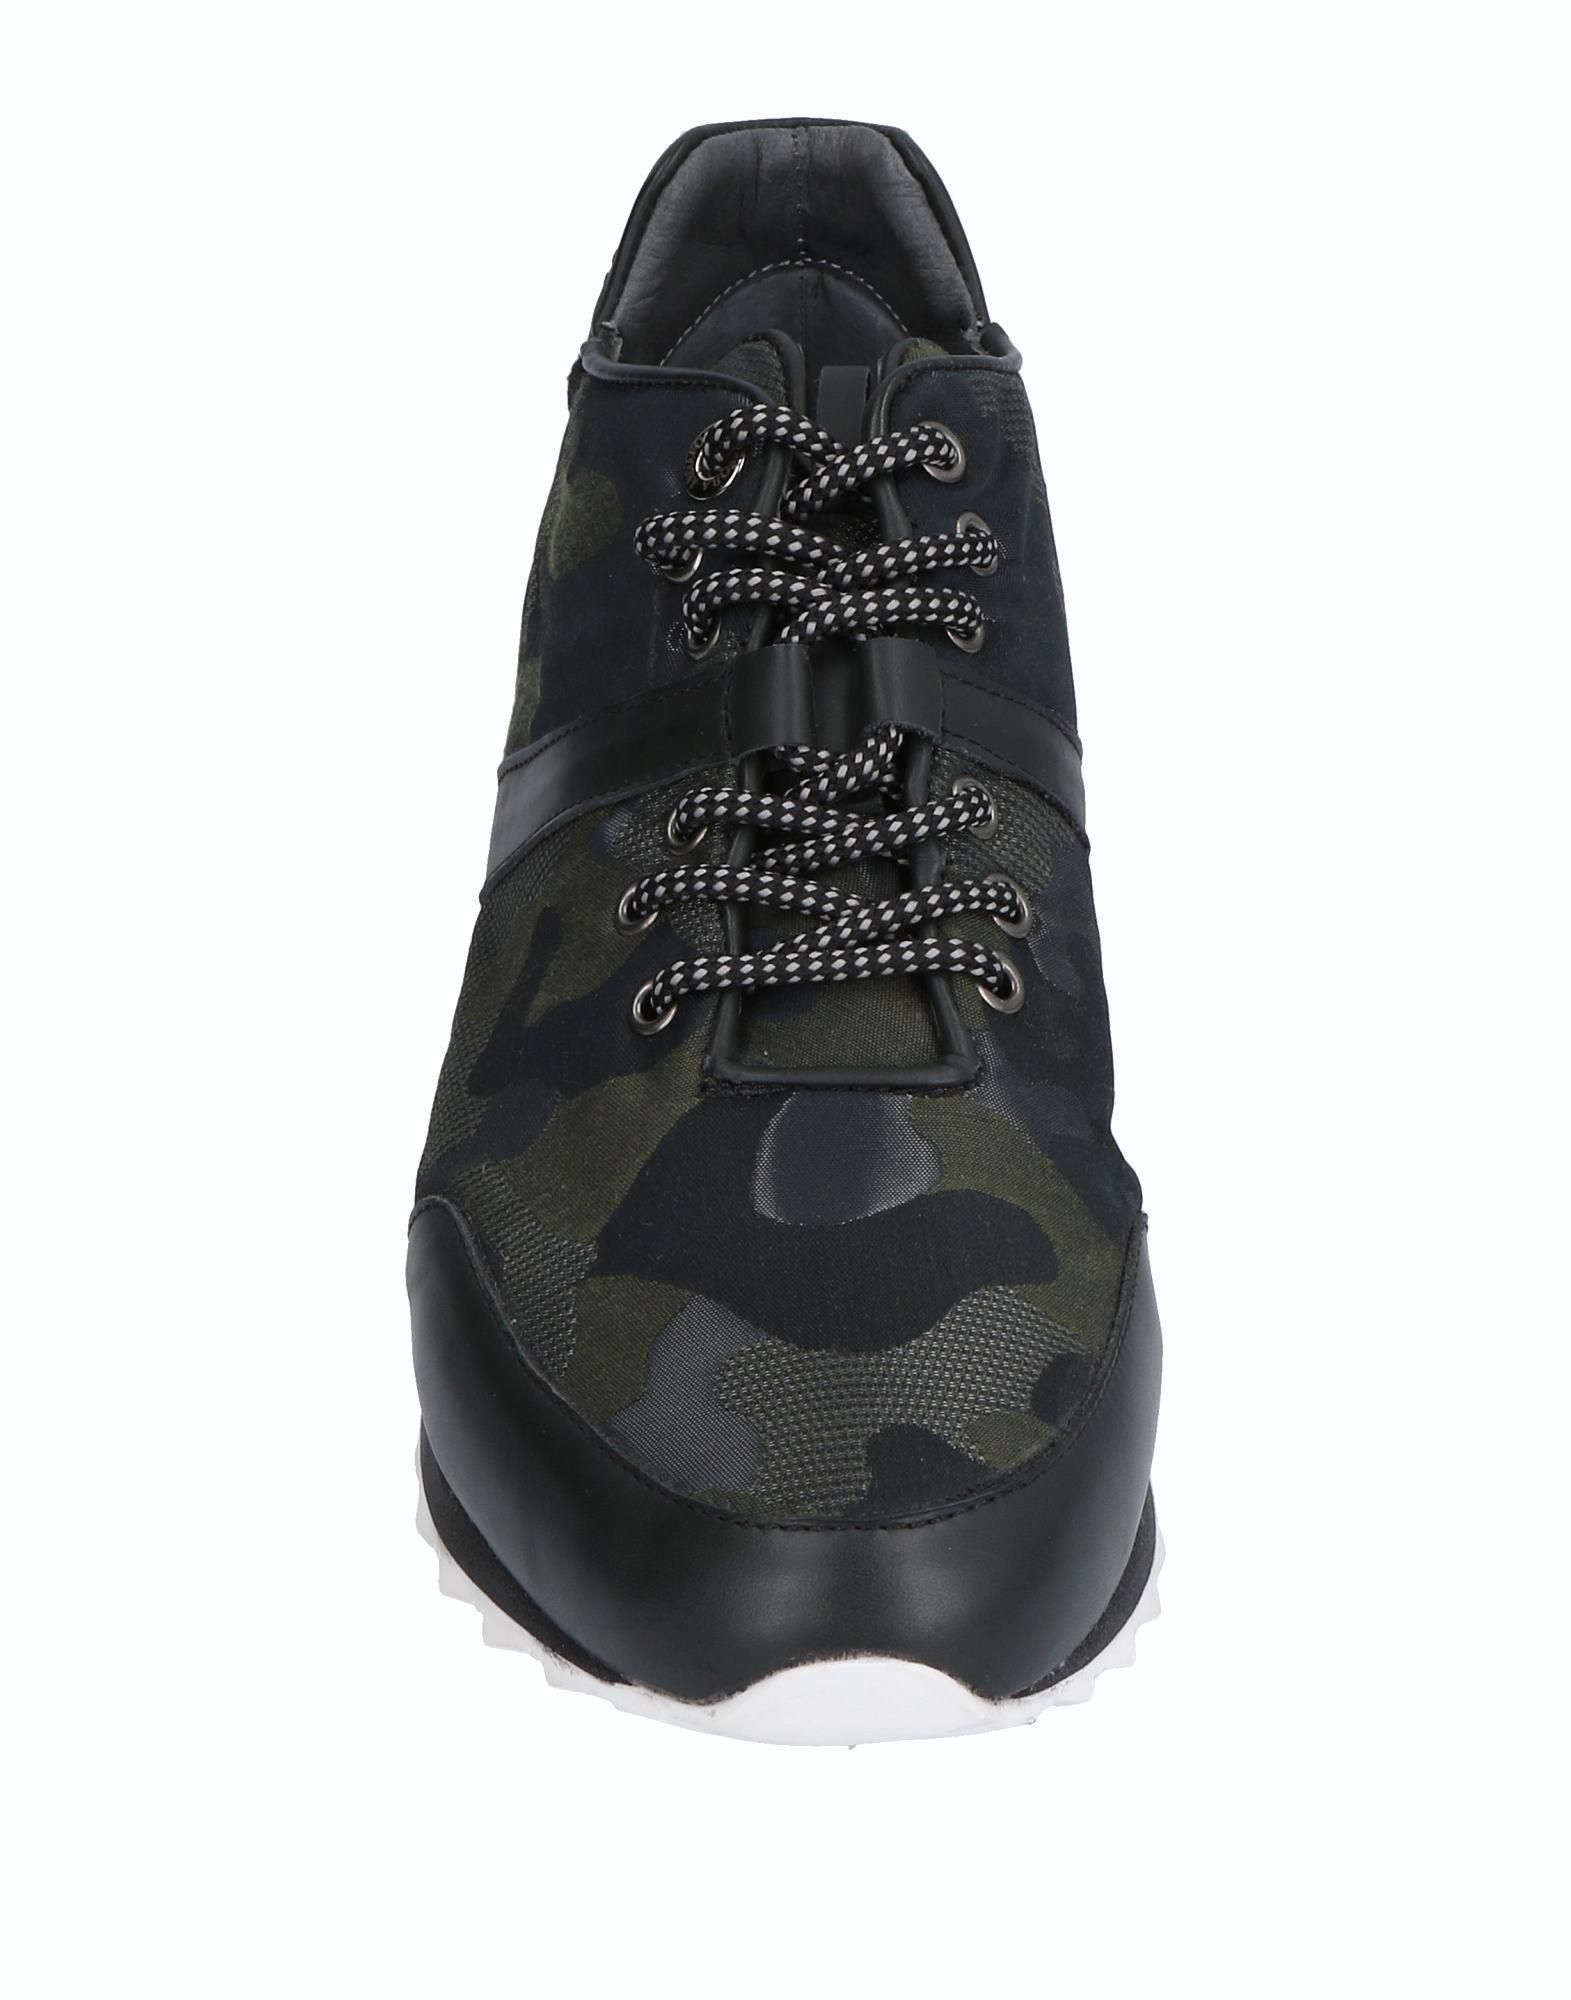 Andìa Fora Sneakers Herren Herren Sneakers  11507136KE Neue Schuhe a623f3